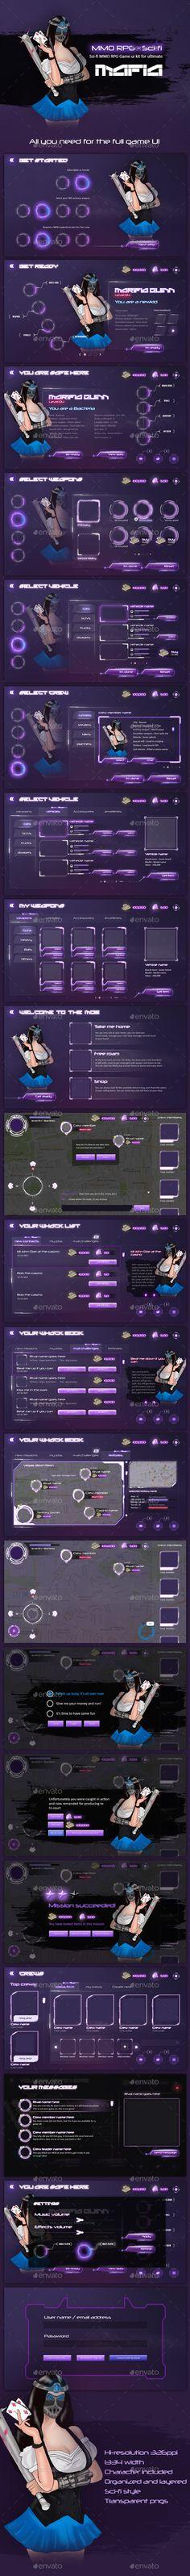 MMO RPG - Full Mafia Game UI - User Interfaces Game Assets